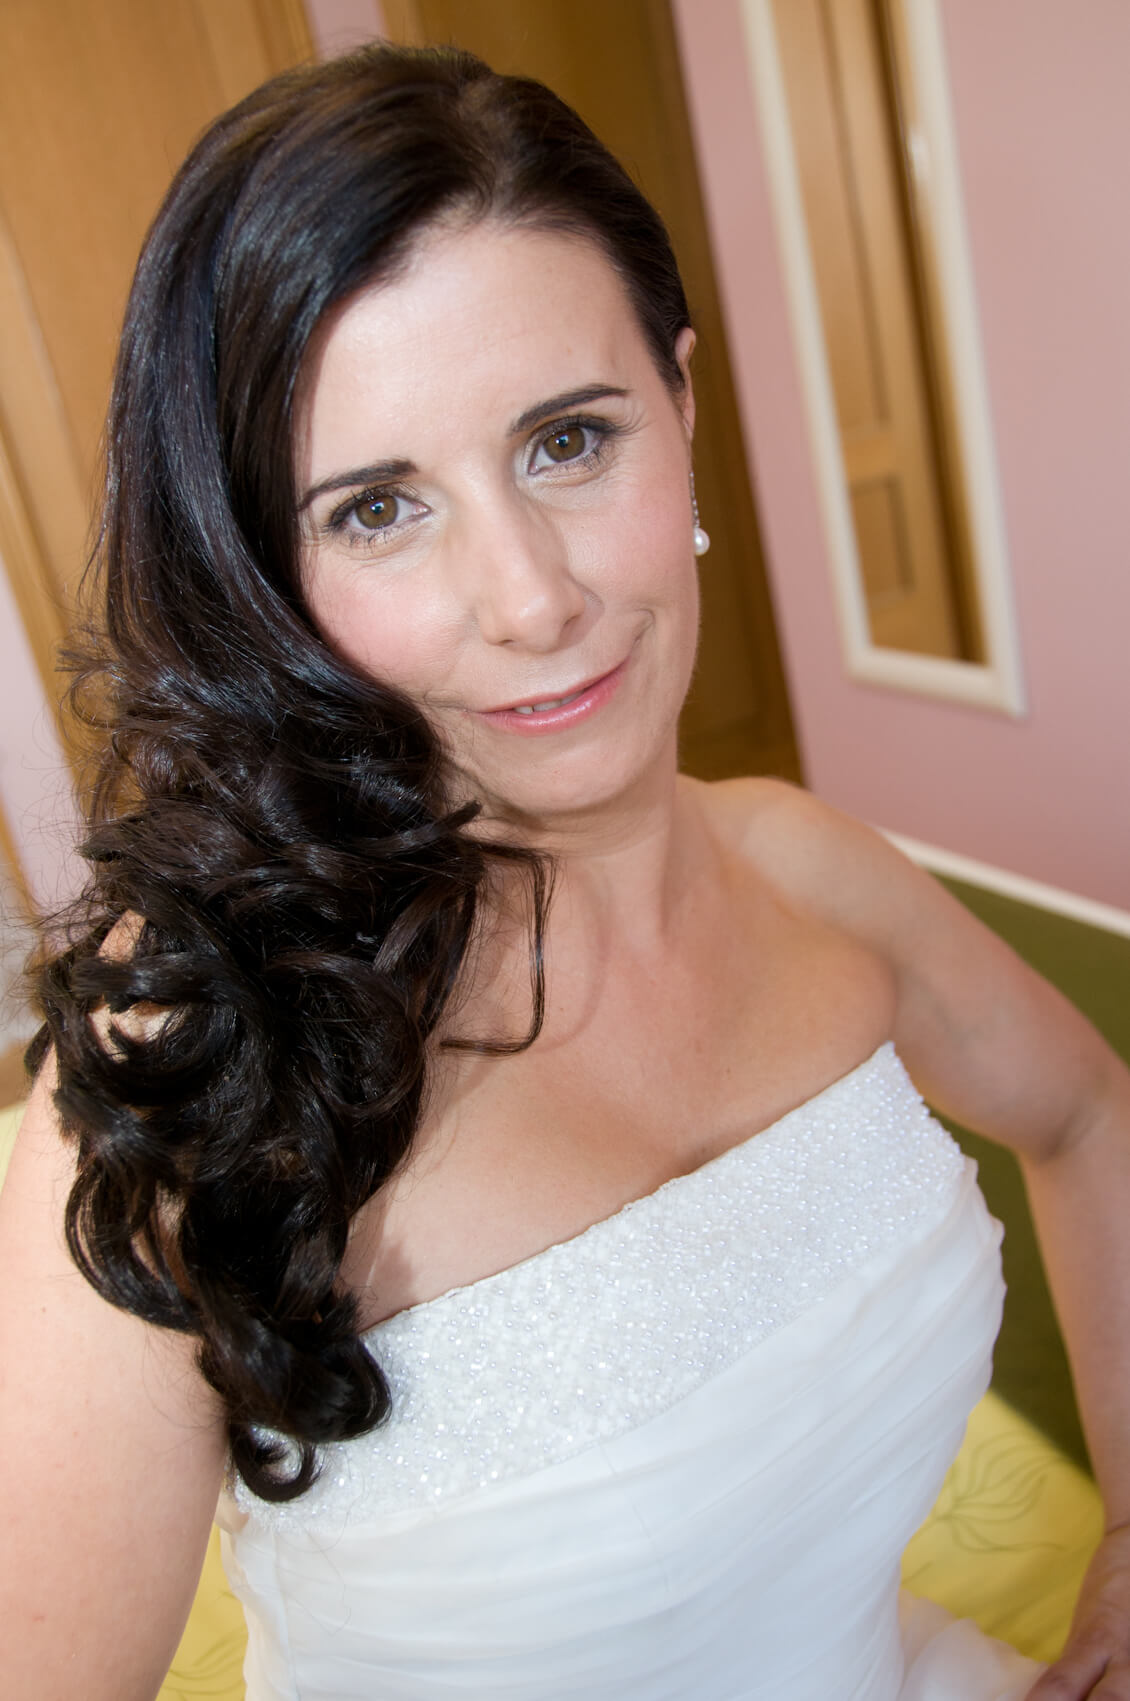 Oferta-peluqueria-novia-a-domicilio-en-madrid-3